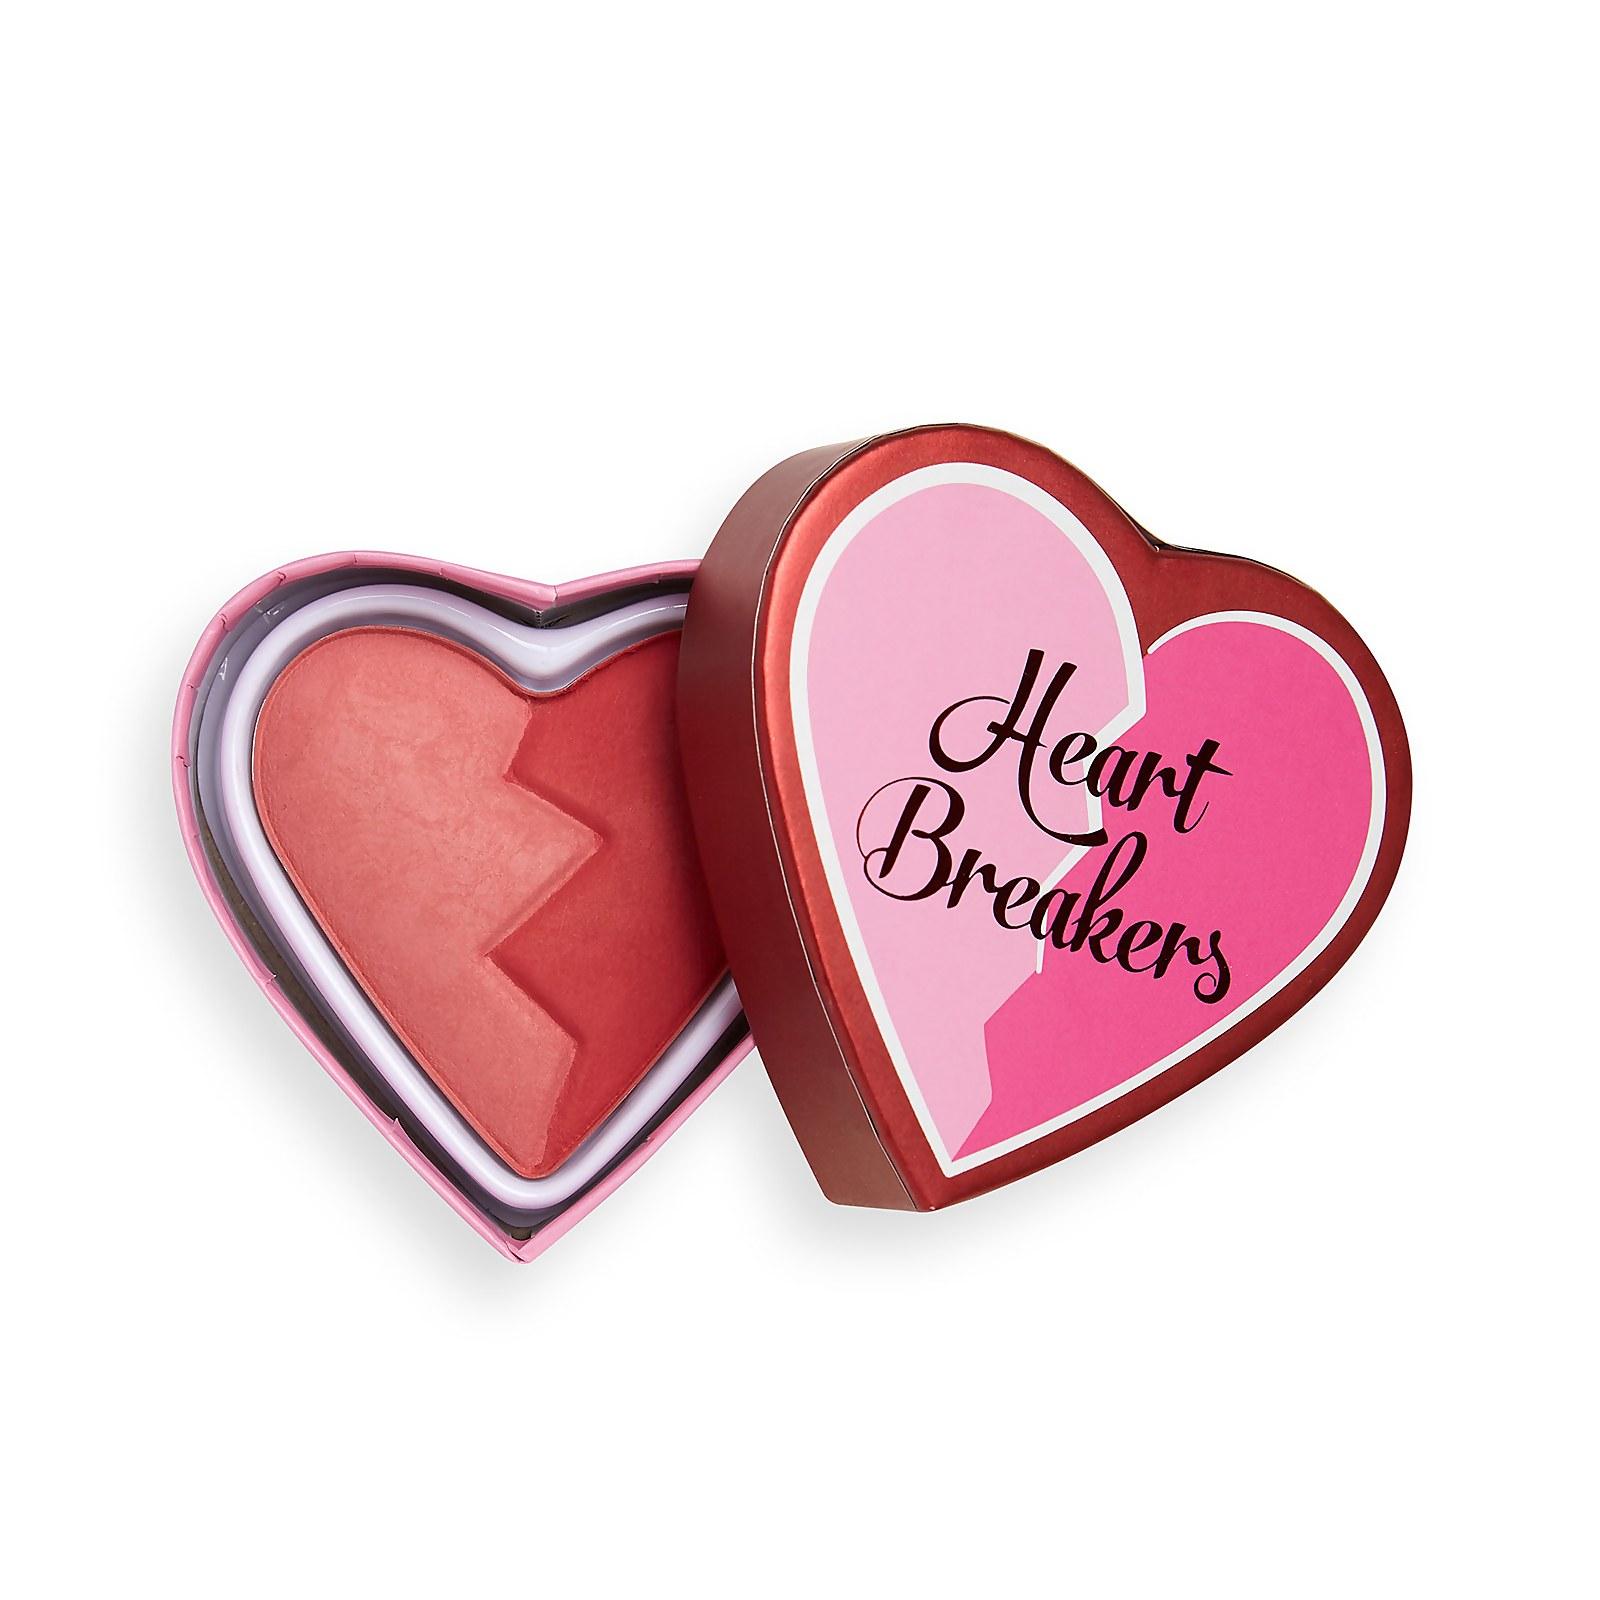 Купить Матовые румяна Revolution I Heart Revolution Heartbreakers Matte Blusher - Kind